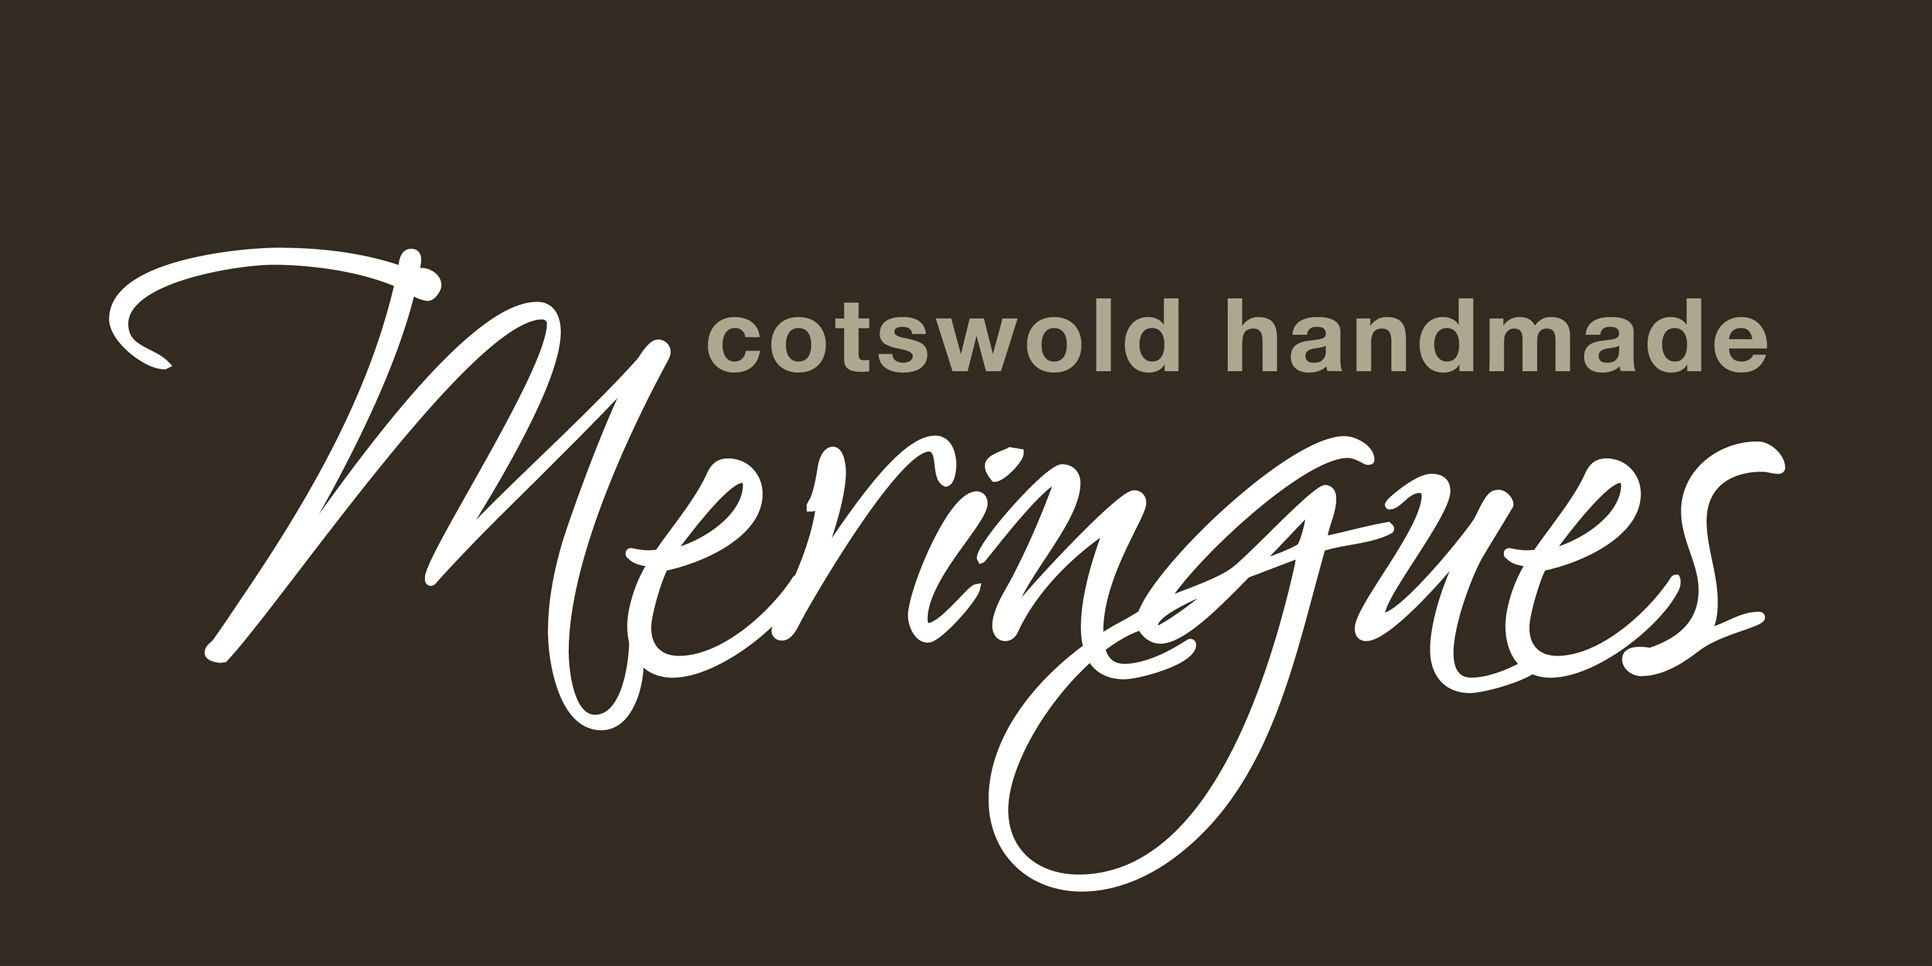 Cotswold handmade meringues logo